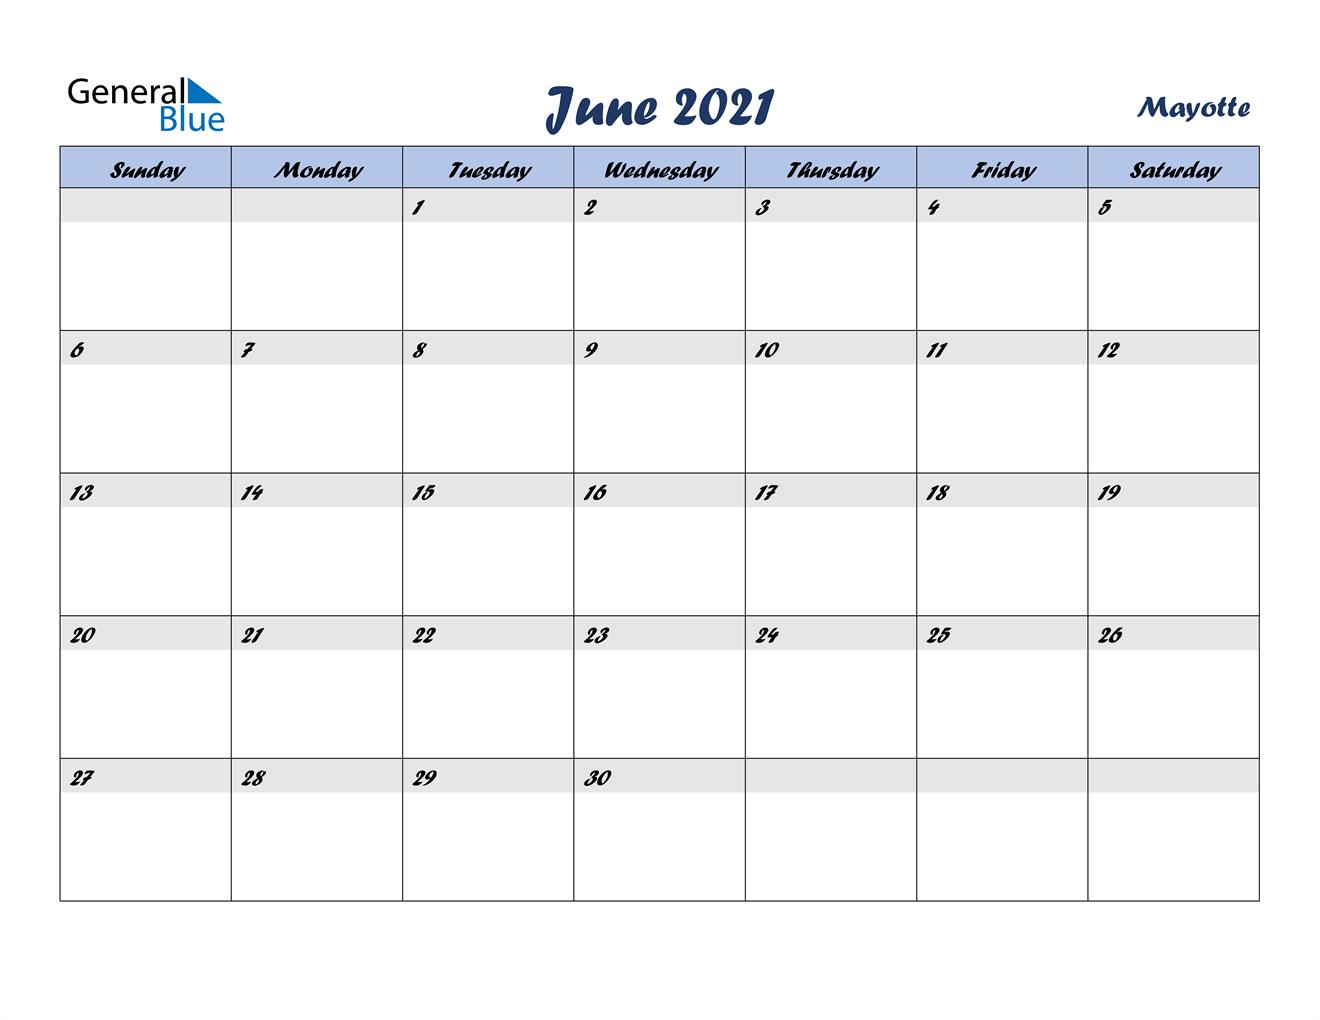 June 2021 Calendar - Mayotte